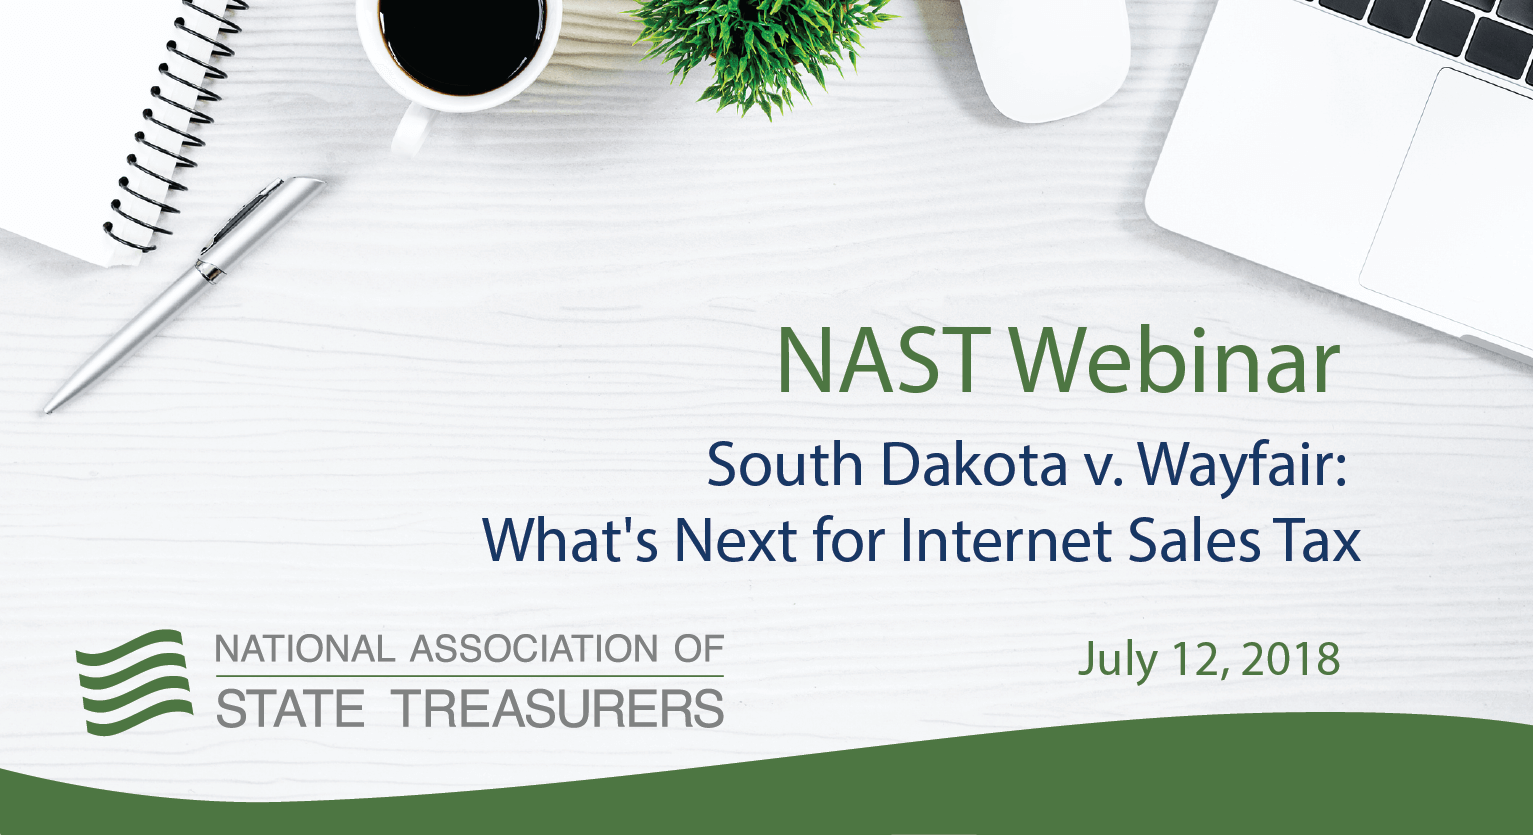 South Dakota v. Wayfair: What's Next for Internet Sales Tax